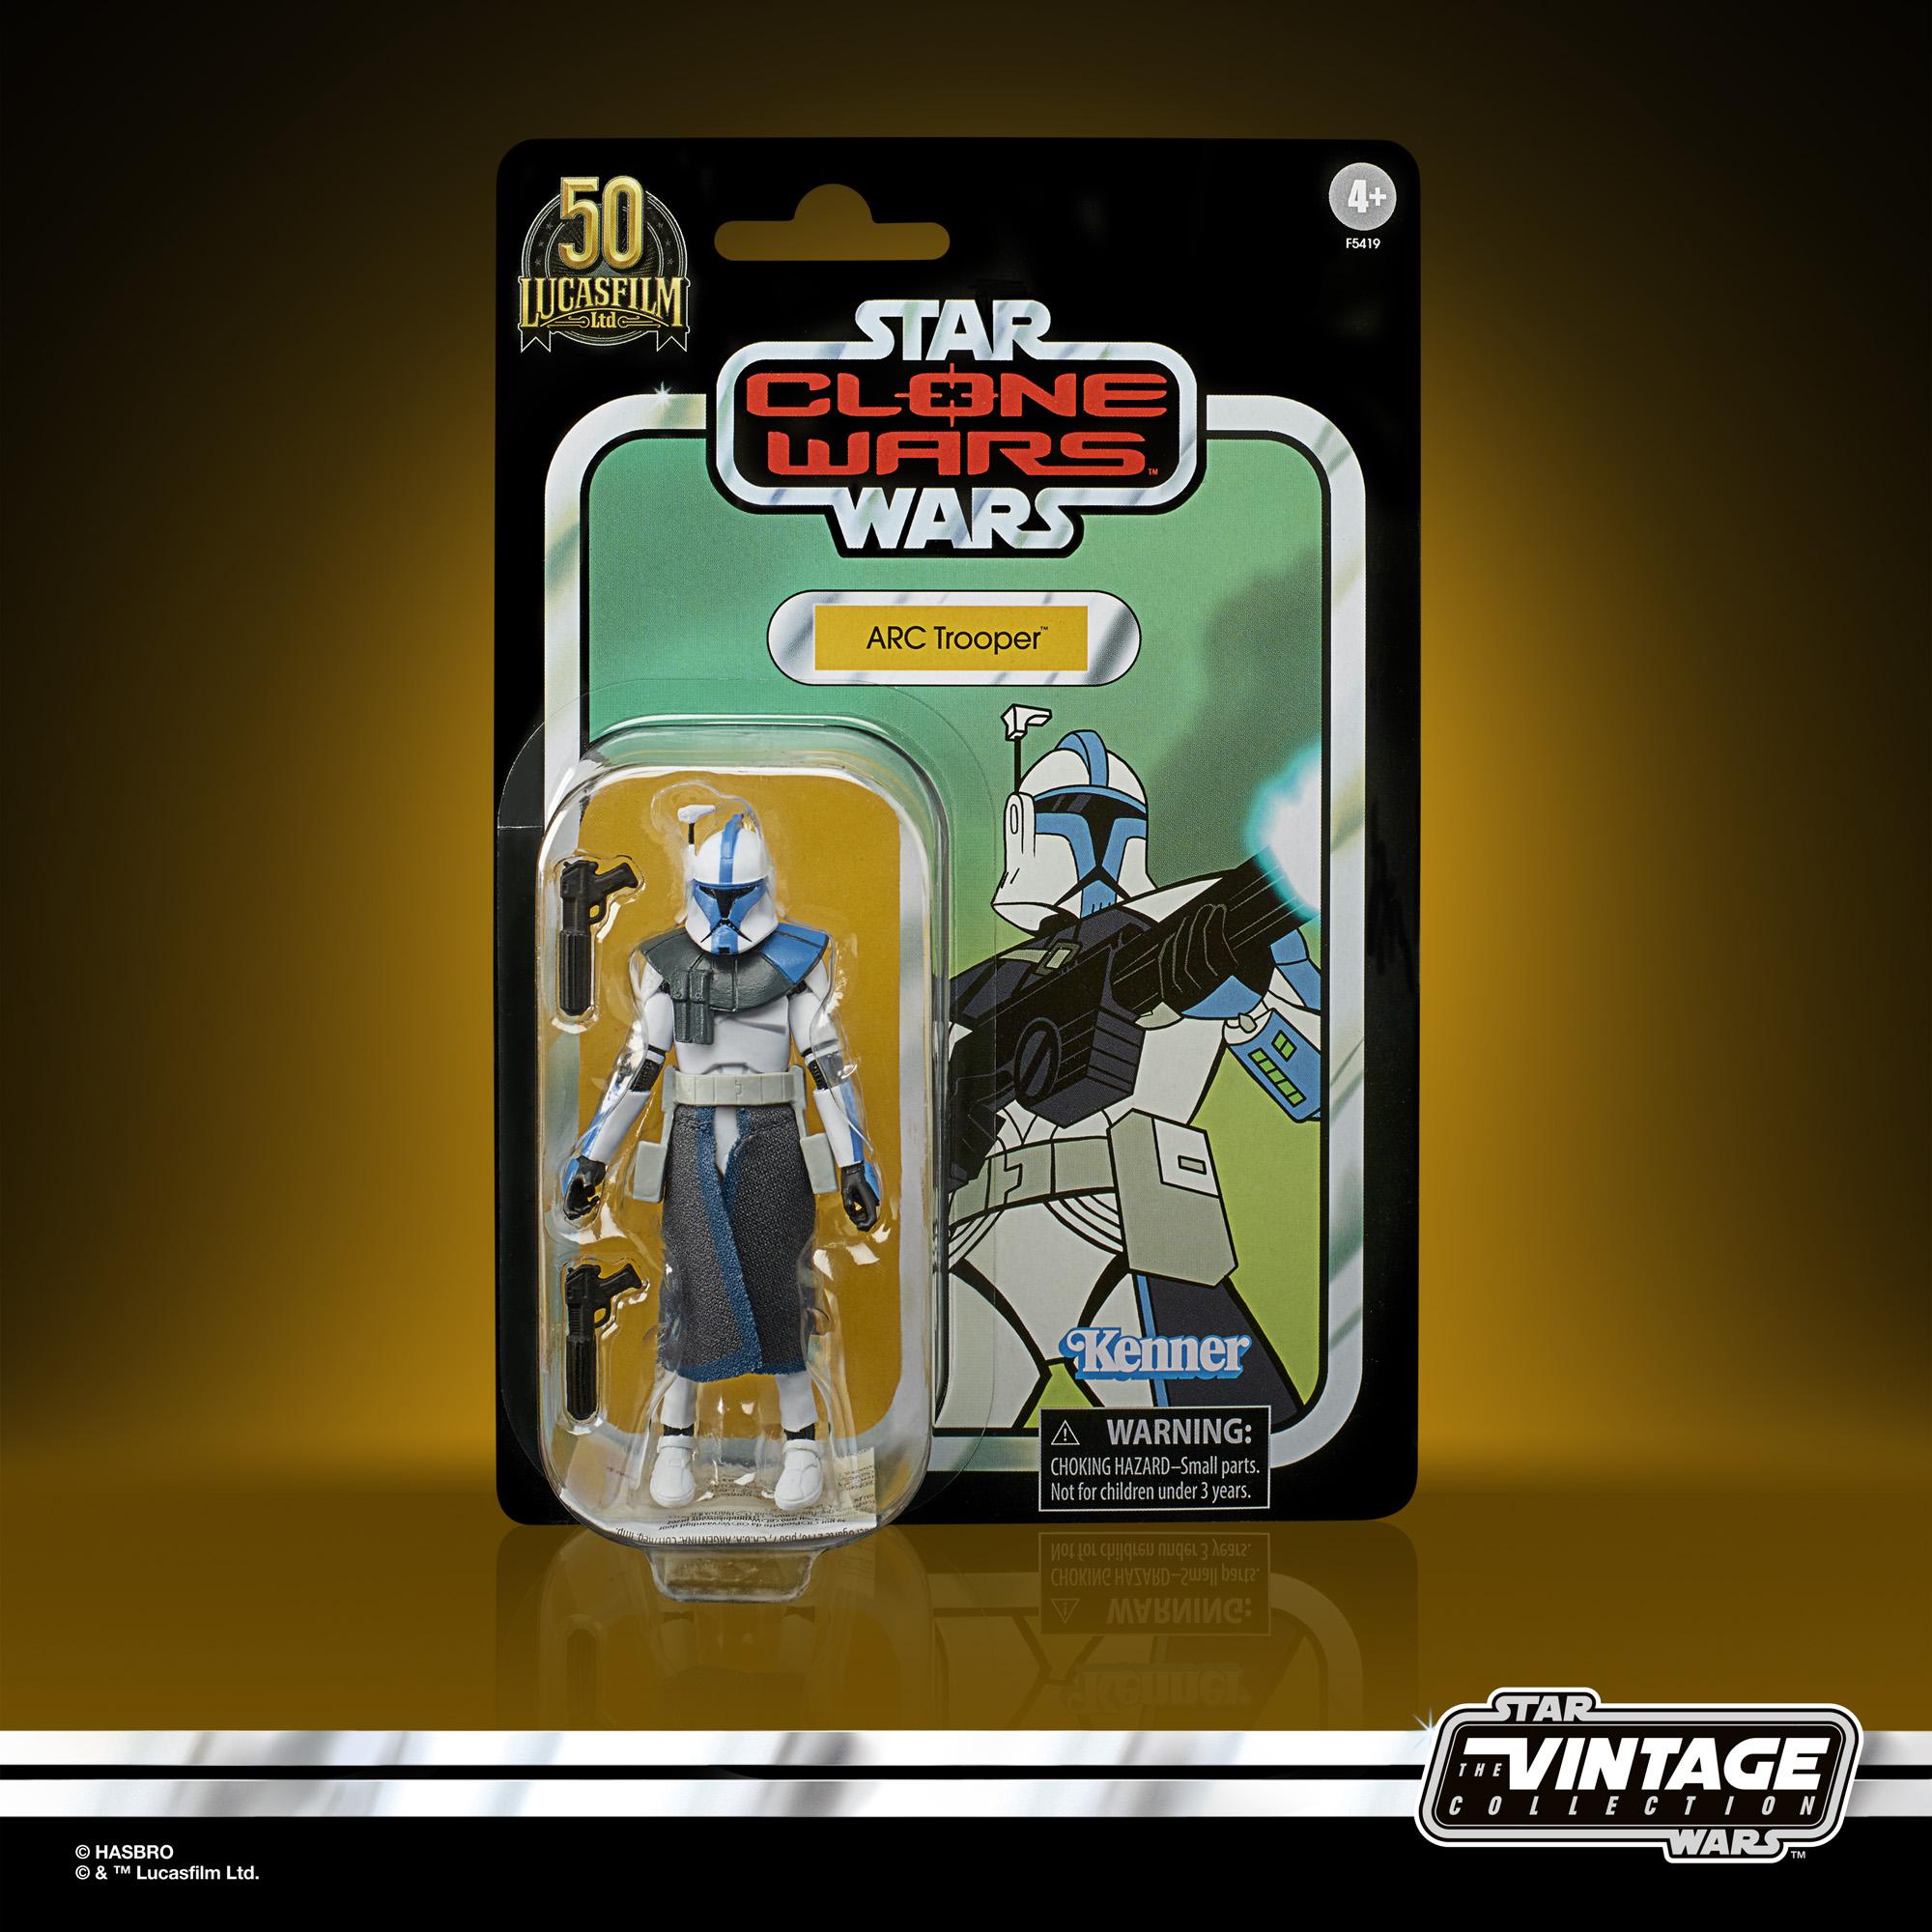 VC-ARC-Trooper-TCW-Micro-Lucasfilm-50th-Anniversary-Carded-1.jpg